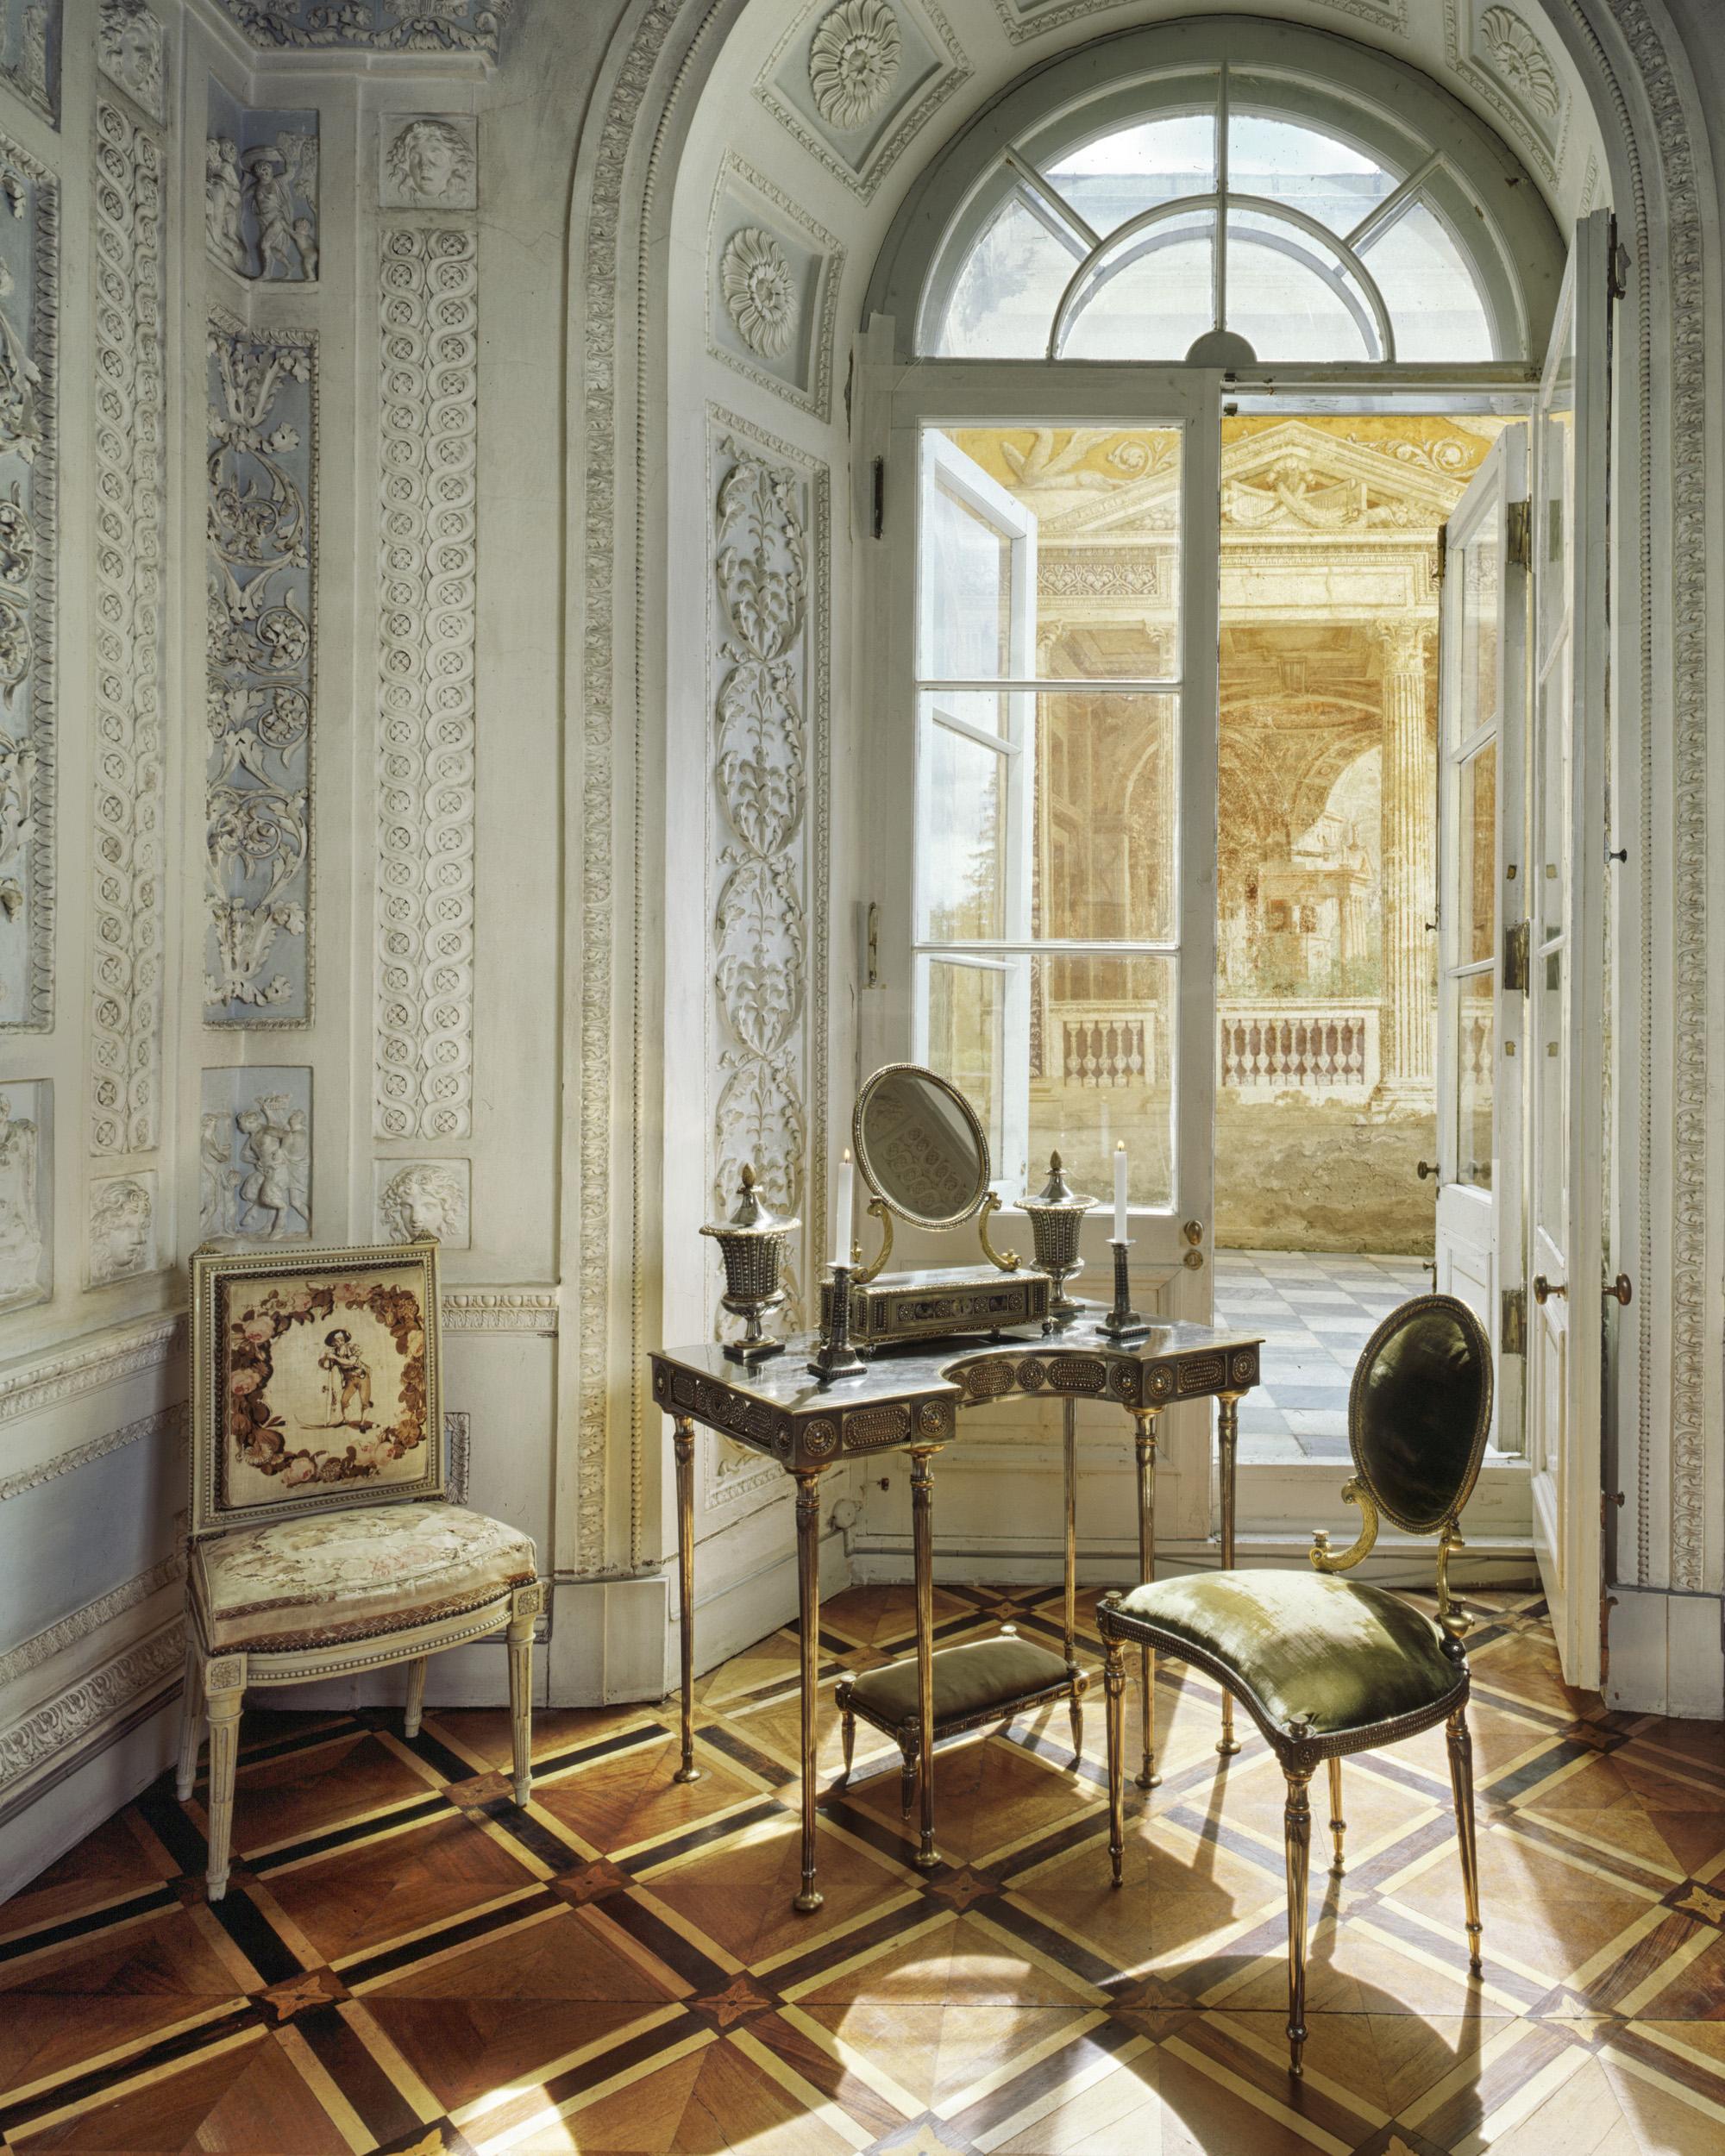 Pavlovsk Palace, Cabinet of Maria Feodorovna - Saint-Petersburg , Russia (1995)